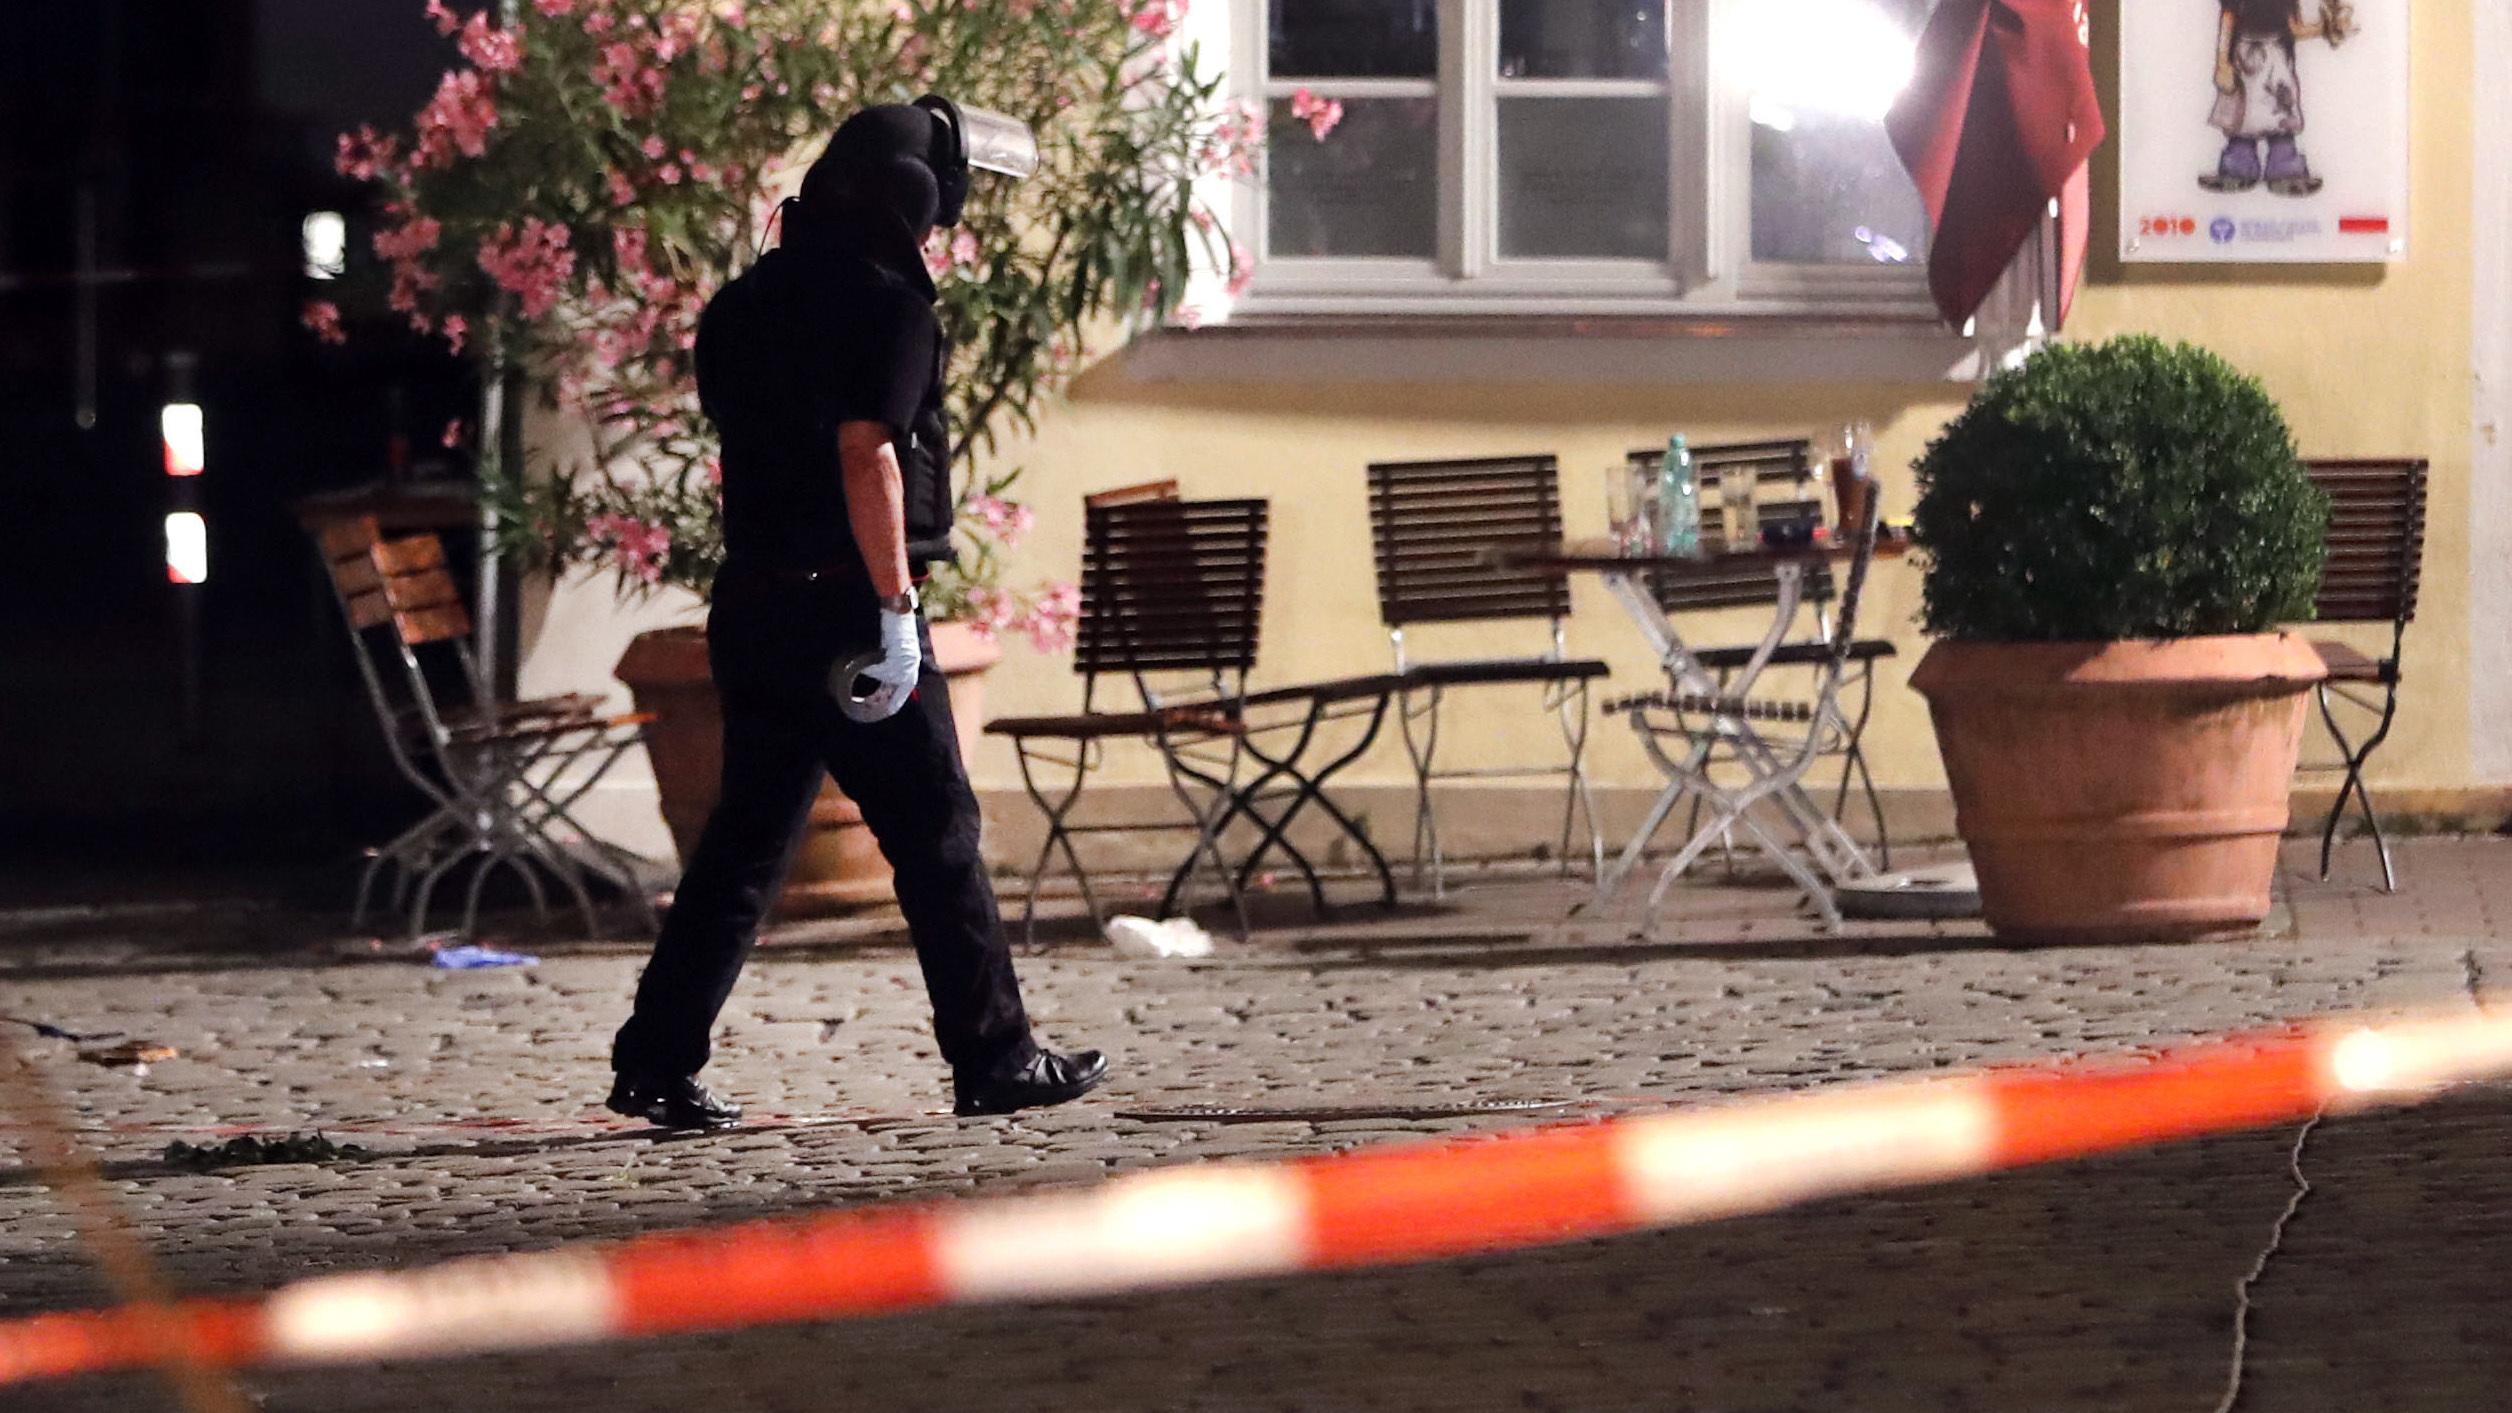 Syrian man detonates bomb near German music festival